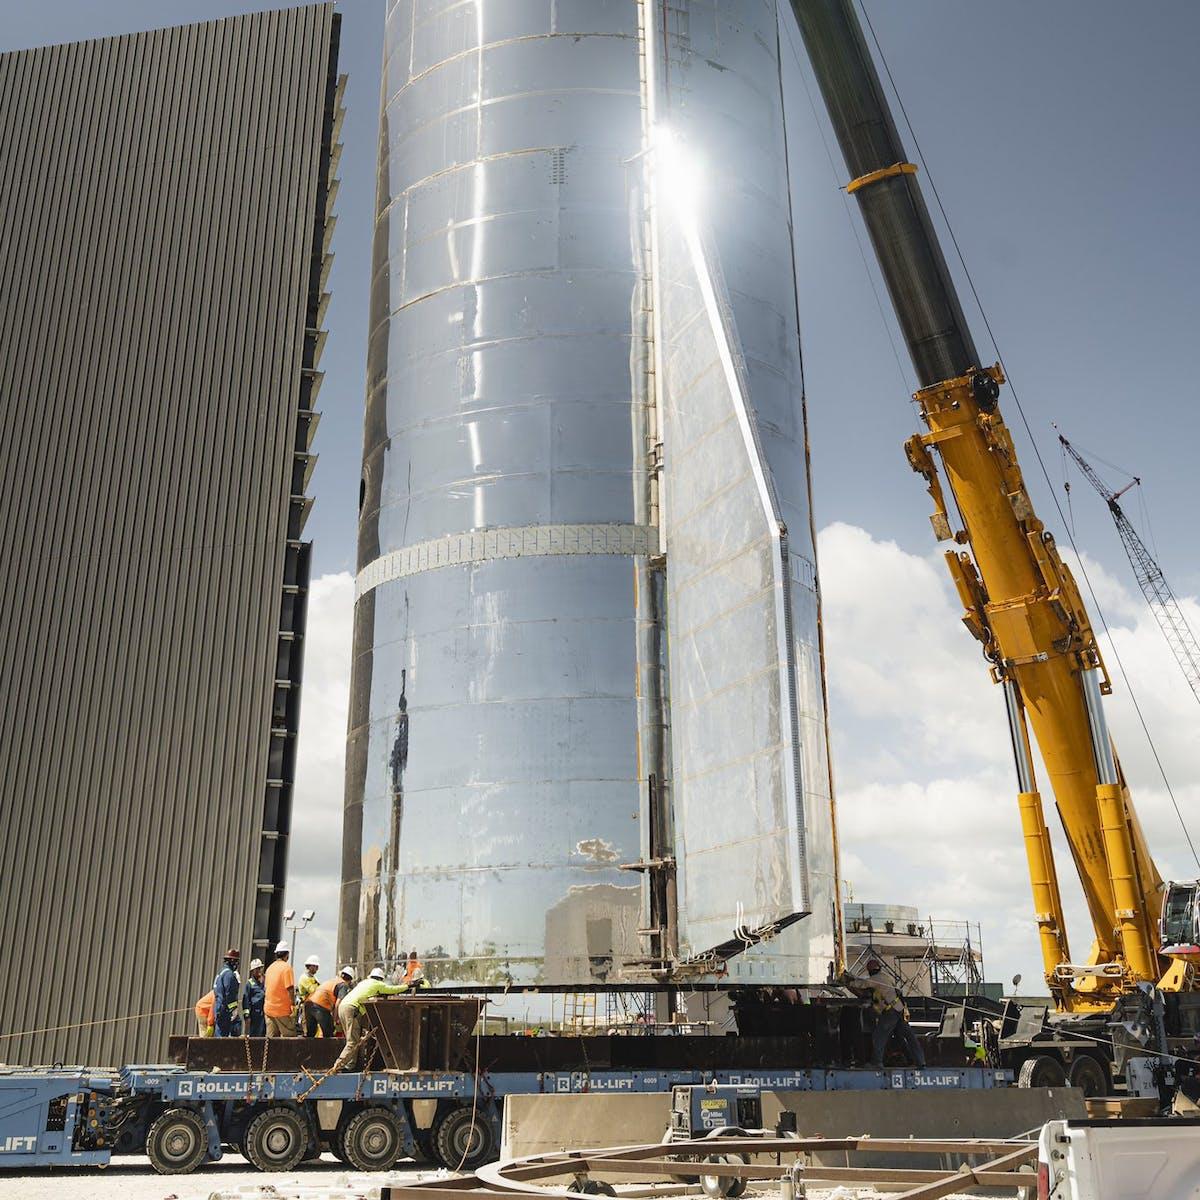 SpaceX Starship: Elon Musk shares rapid progress ahead of big reveal event